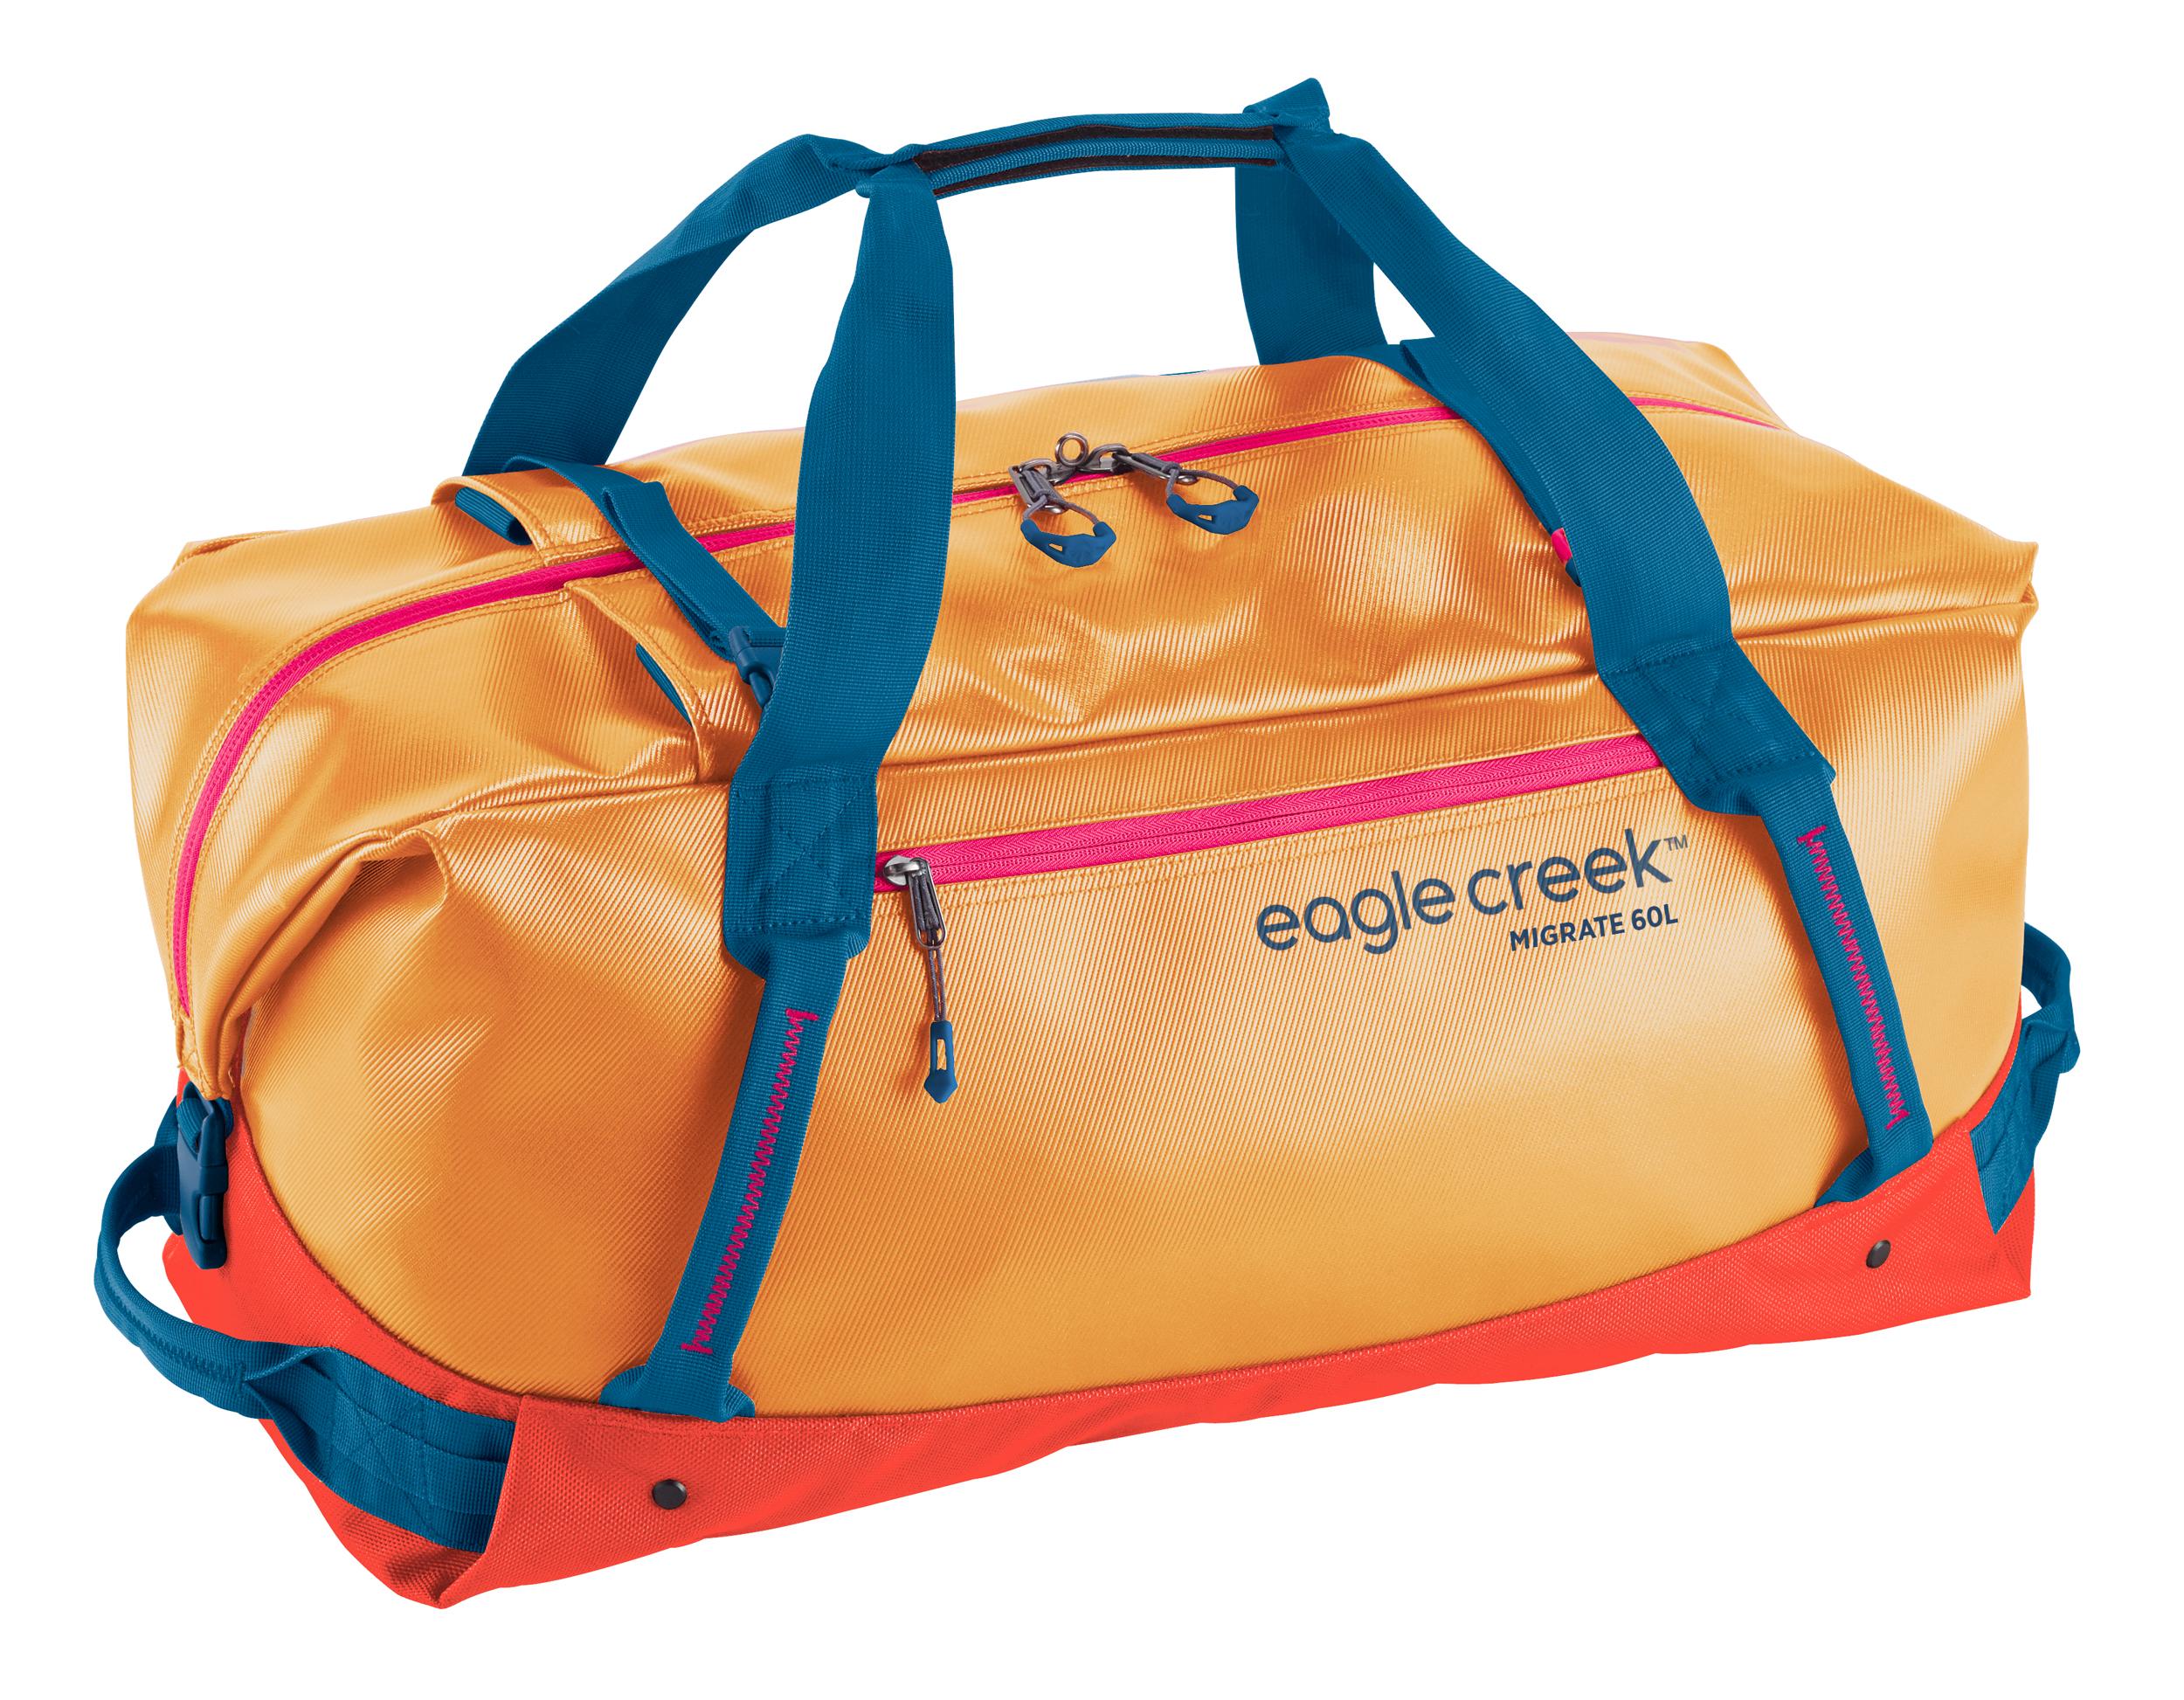 Eagle Creek Migrate Duffel 40 Liter